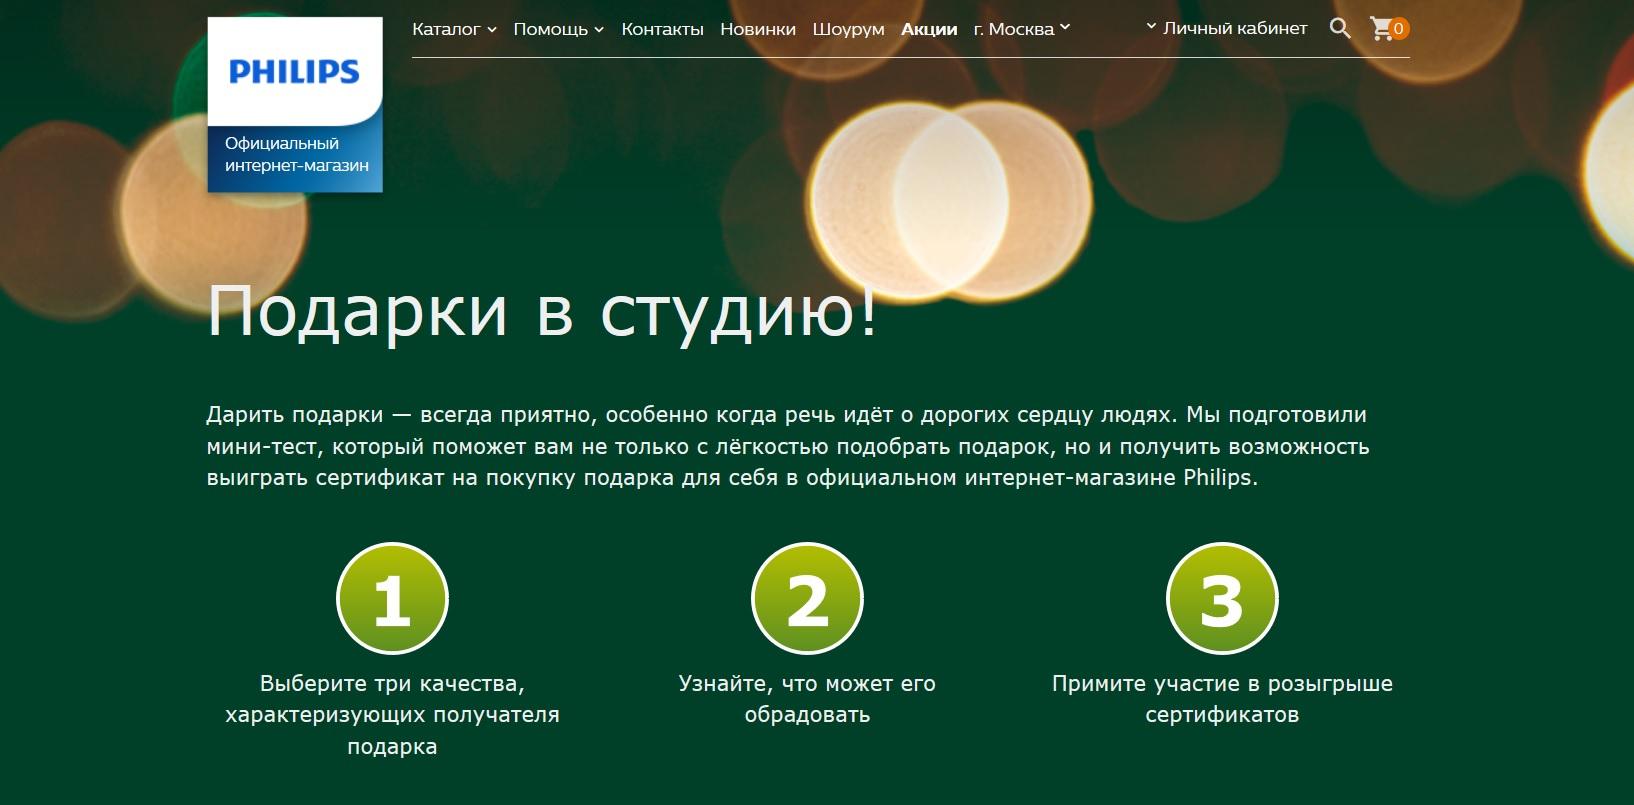 shop.philips.ru акция 2019 года